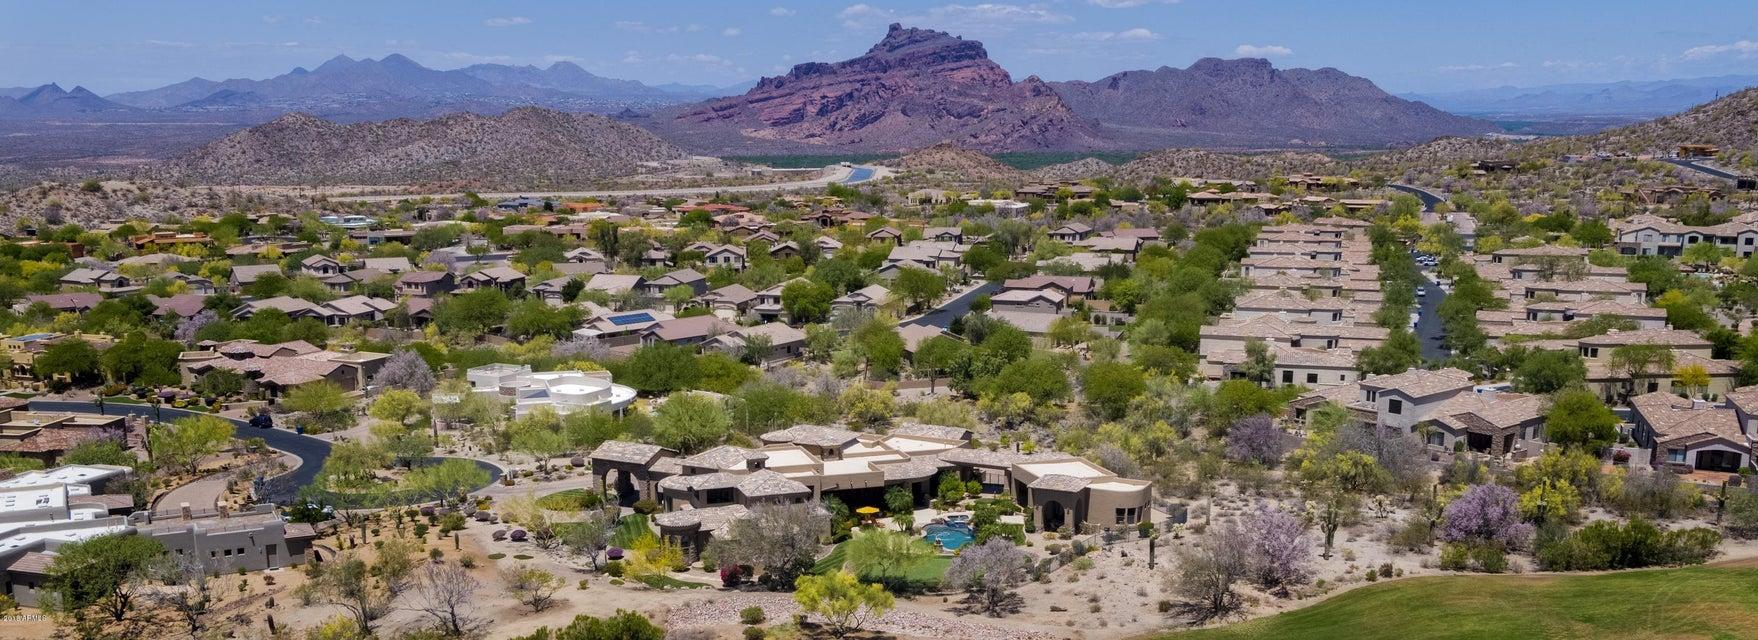 MLS 5772342 4060 N PINNACLE HILLS Circle, Mesa, AZ 85207 Mesa AZ Las Sendas